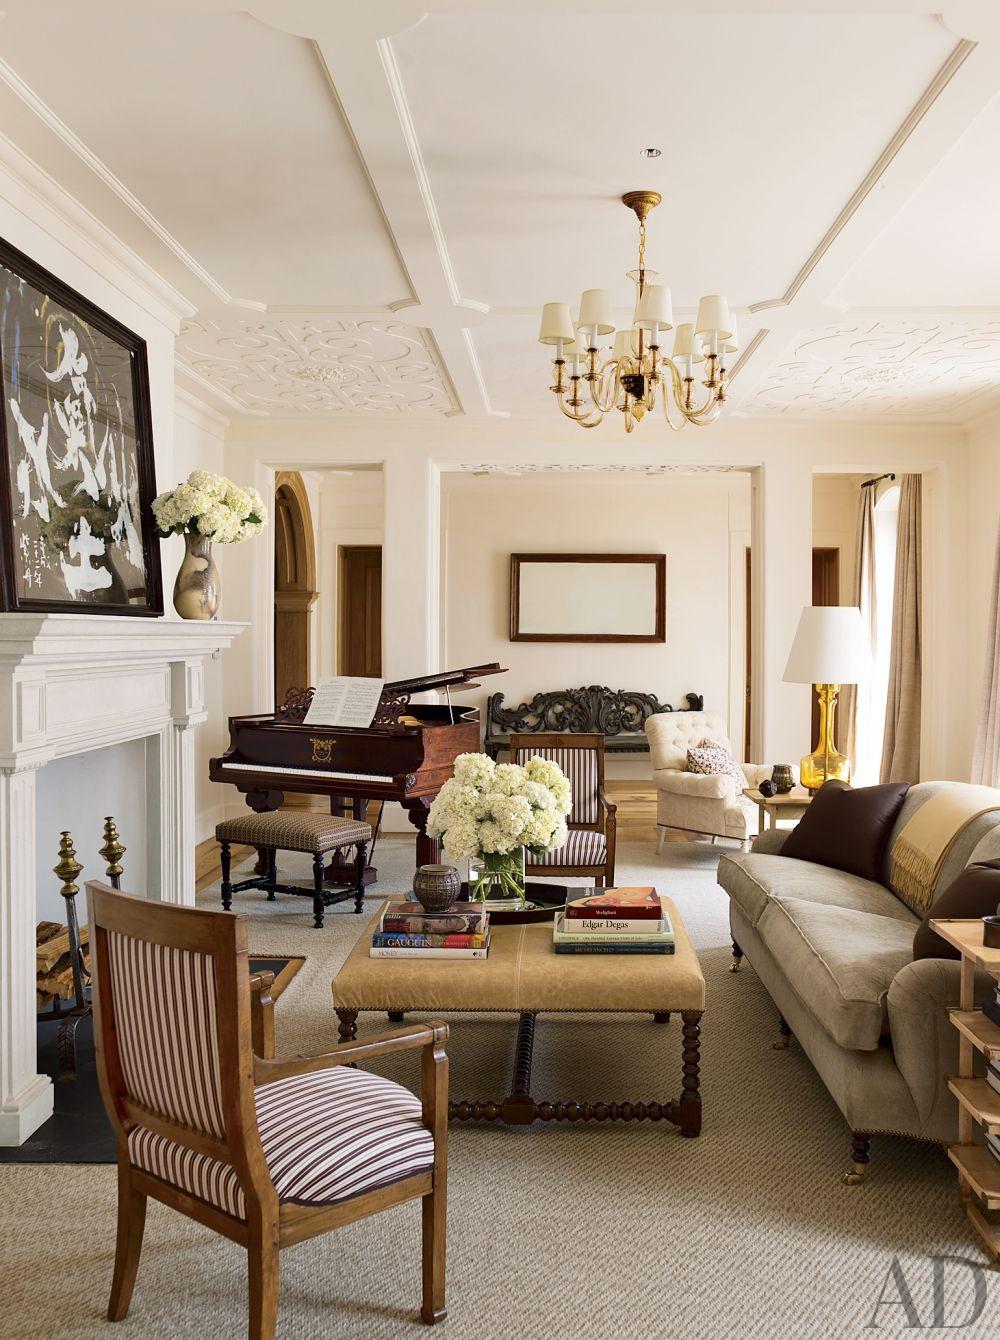 Traditional Living Room by David Kleinberg Design Associates and Atelier & Co in Philadelphia, Pennsylvania